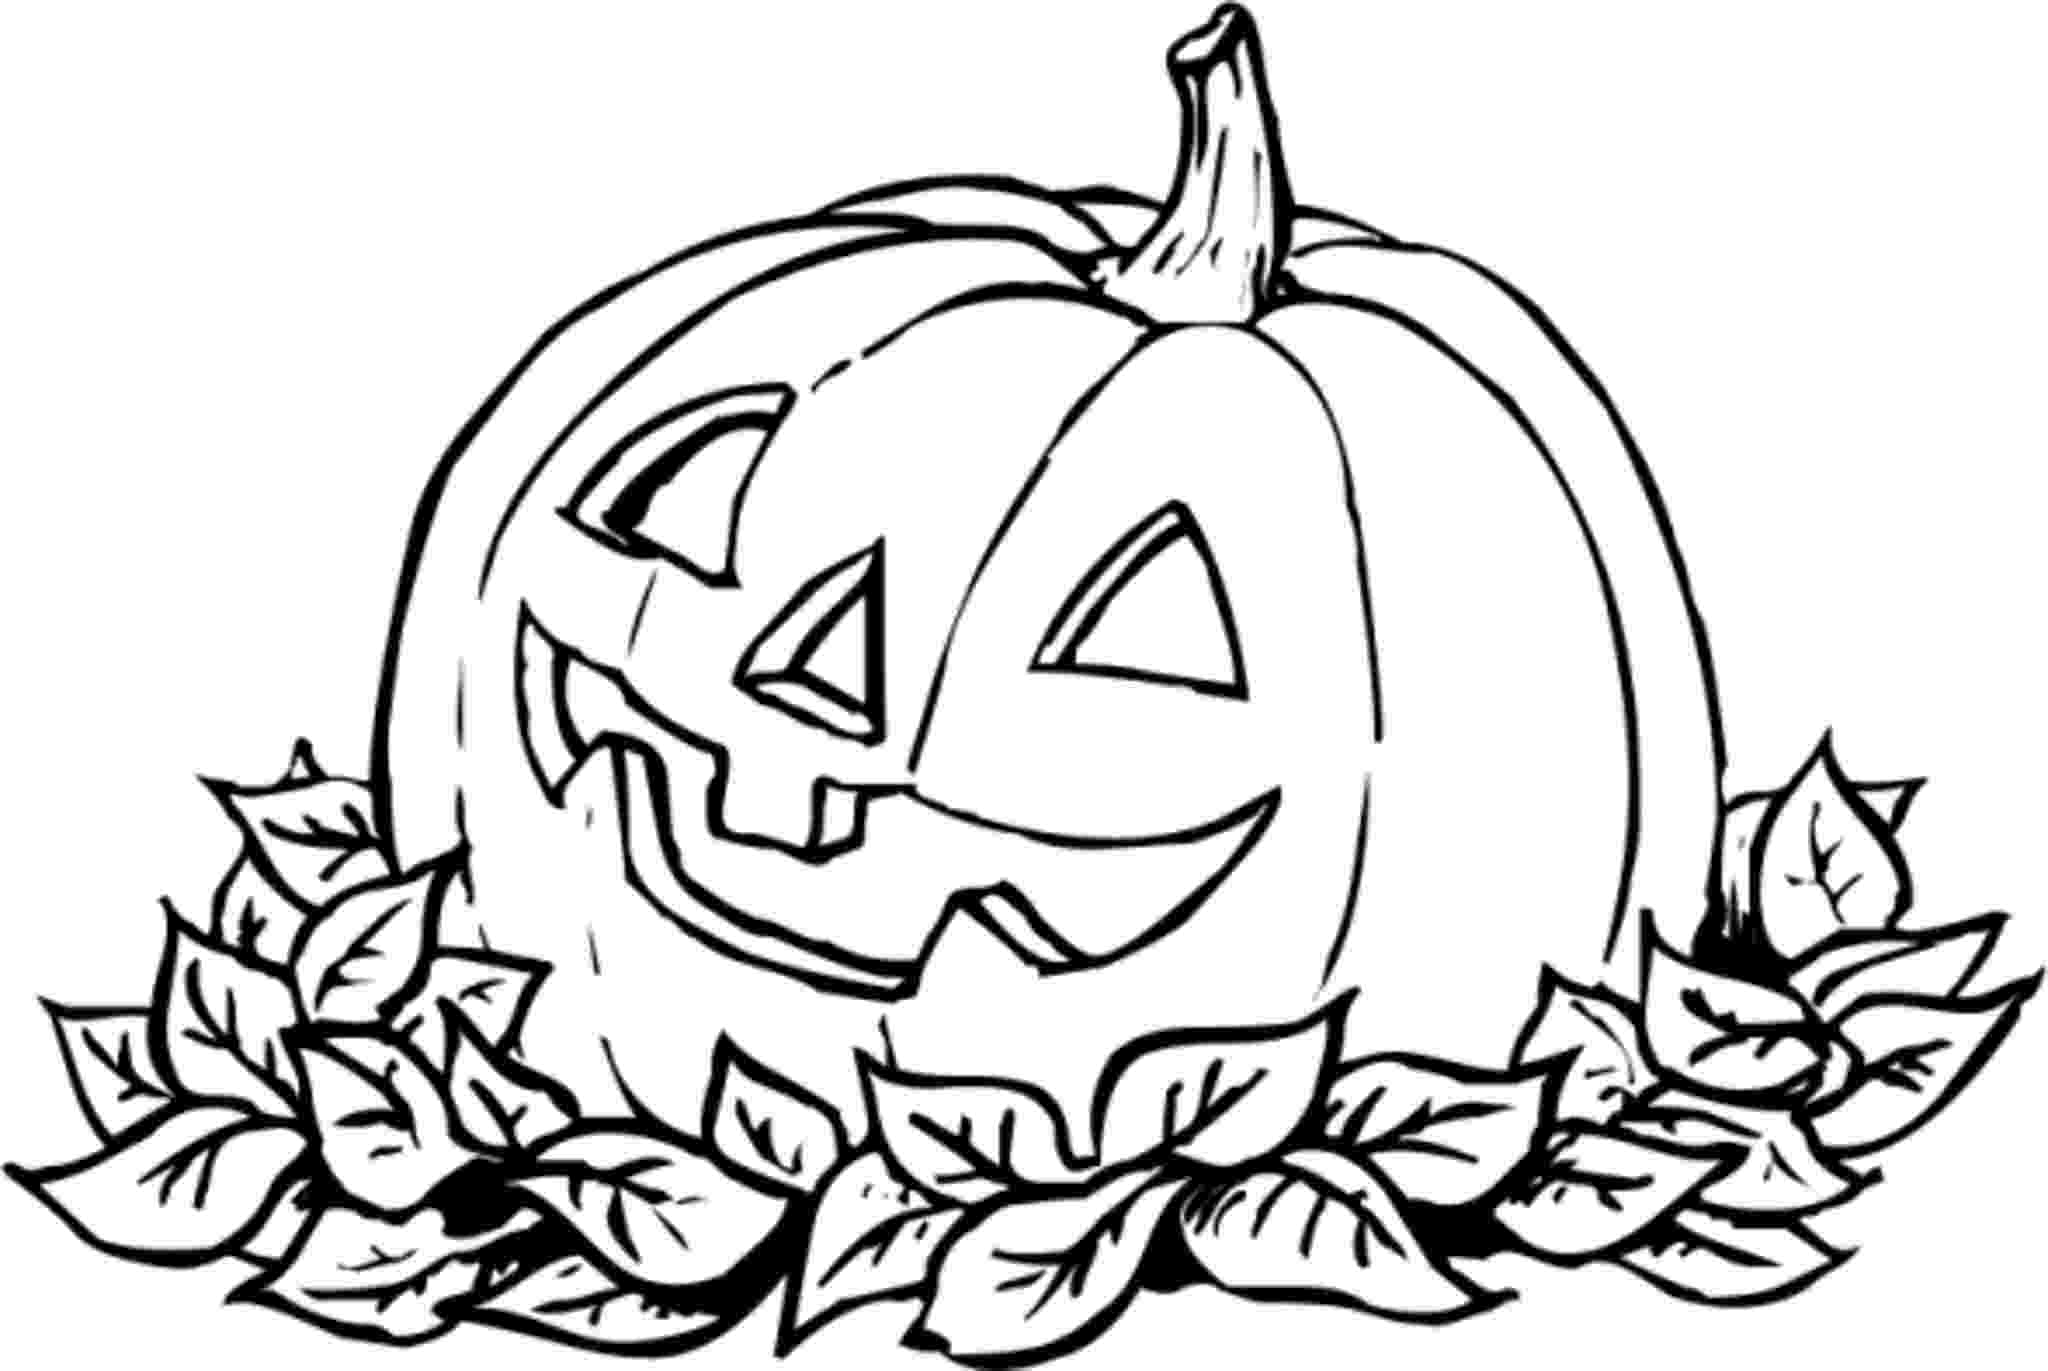 pumpkins coloring page print download pumpkin coloring pages and benefits of pumpkins coloring page